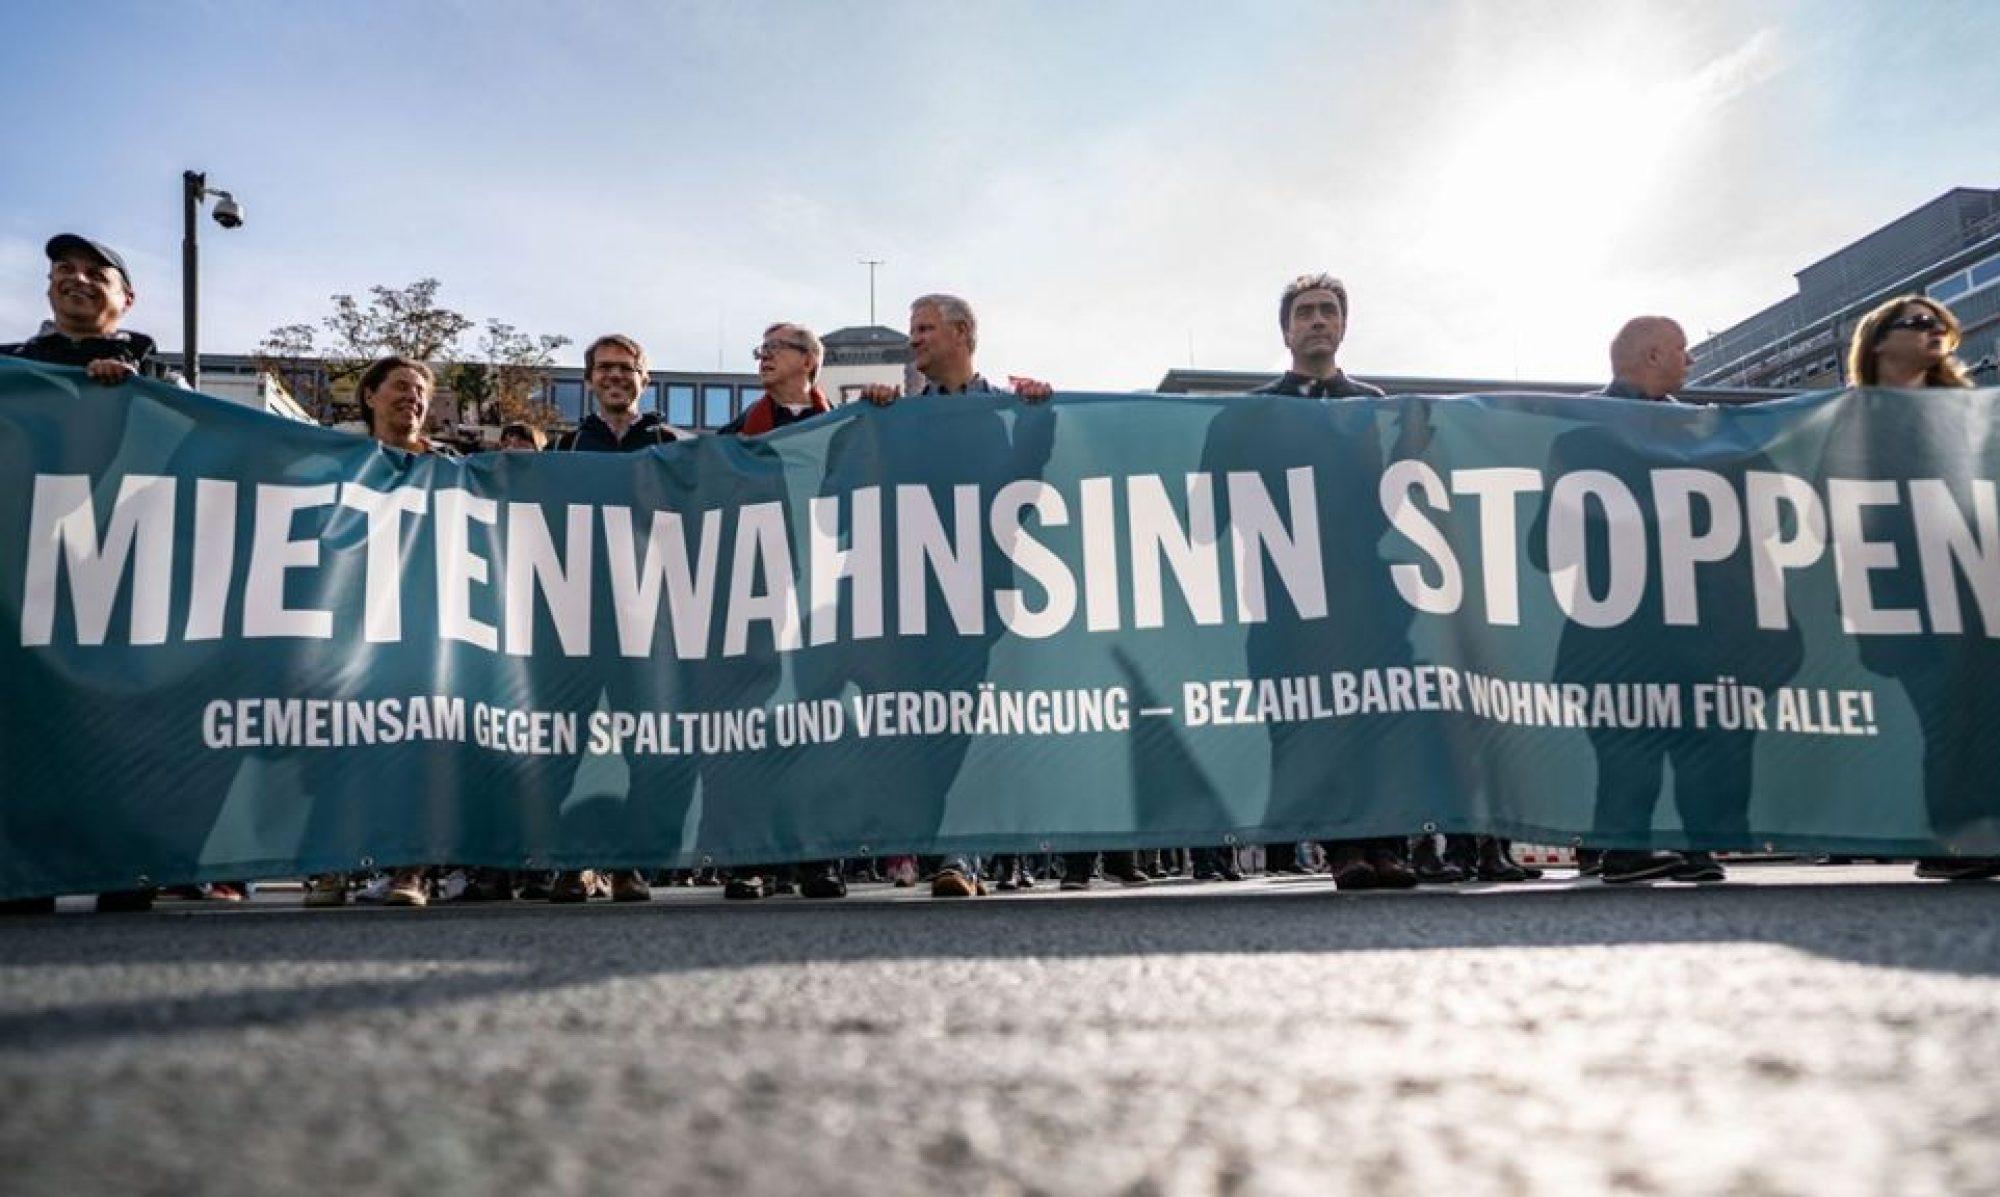 Mietenwahnsinn und Verdrängung stoppen - Trier